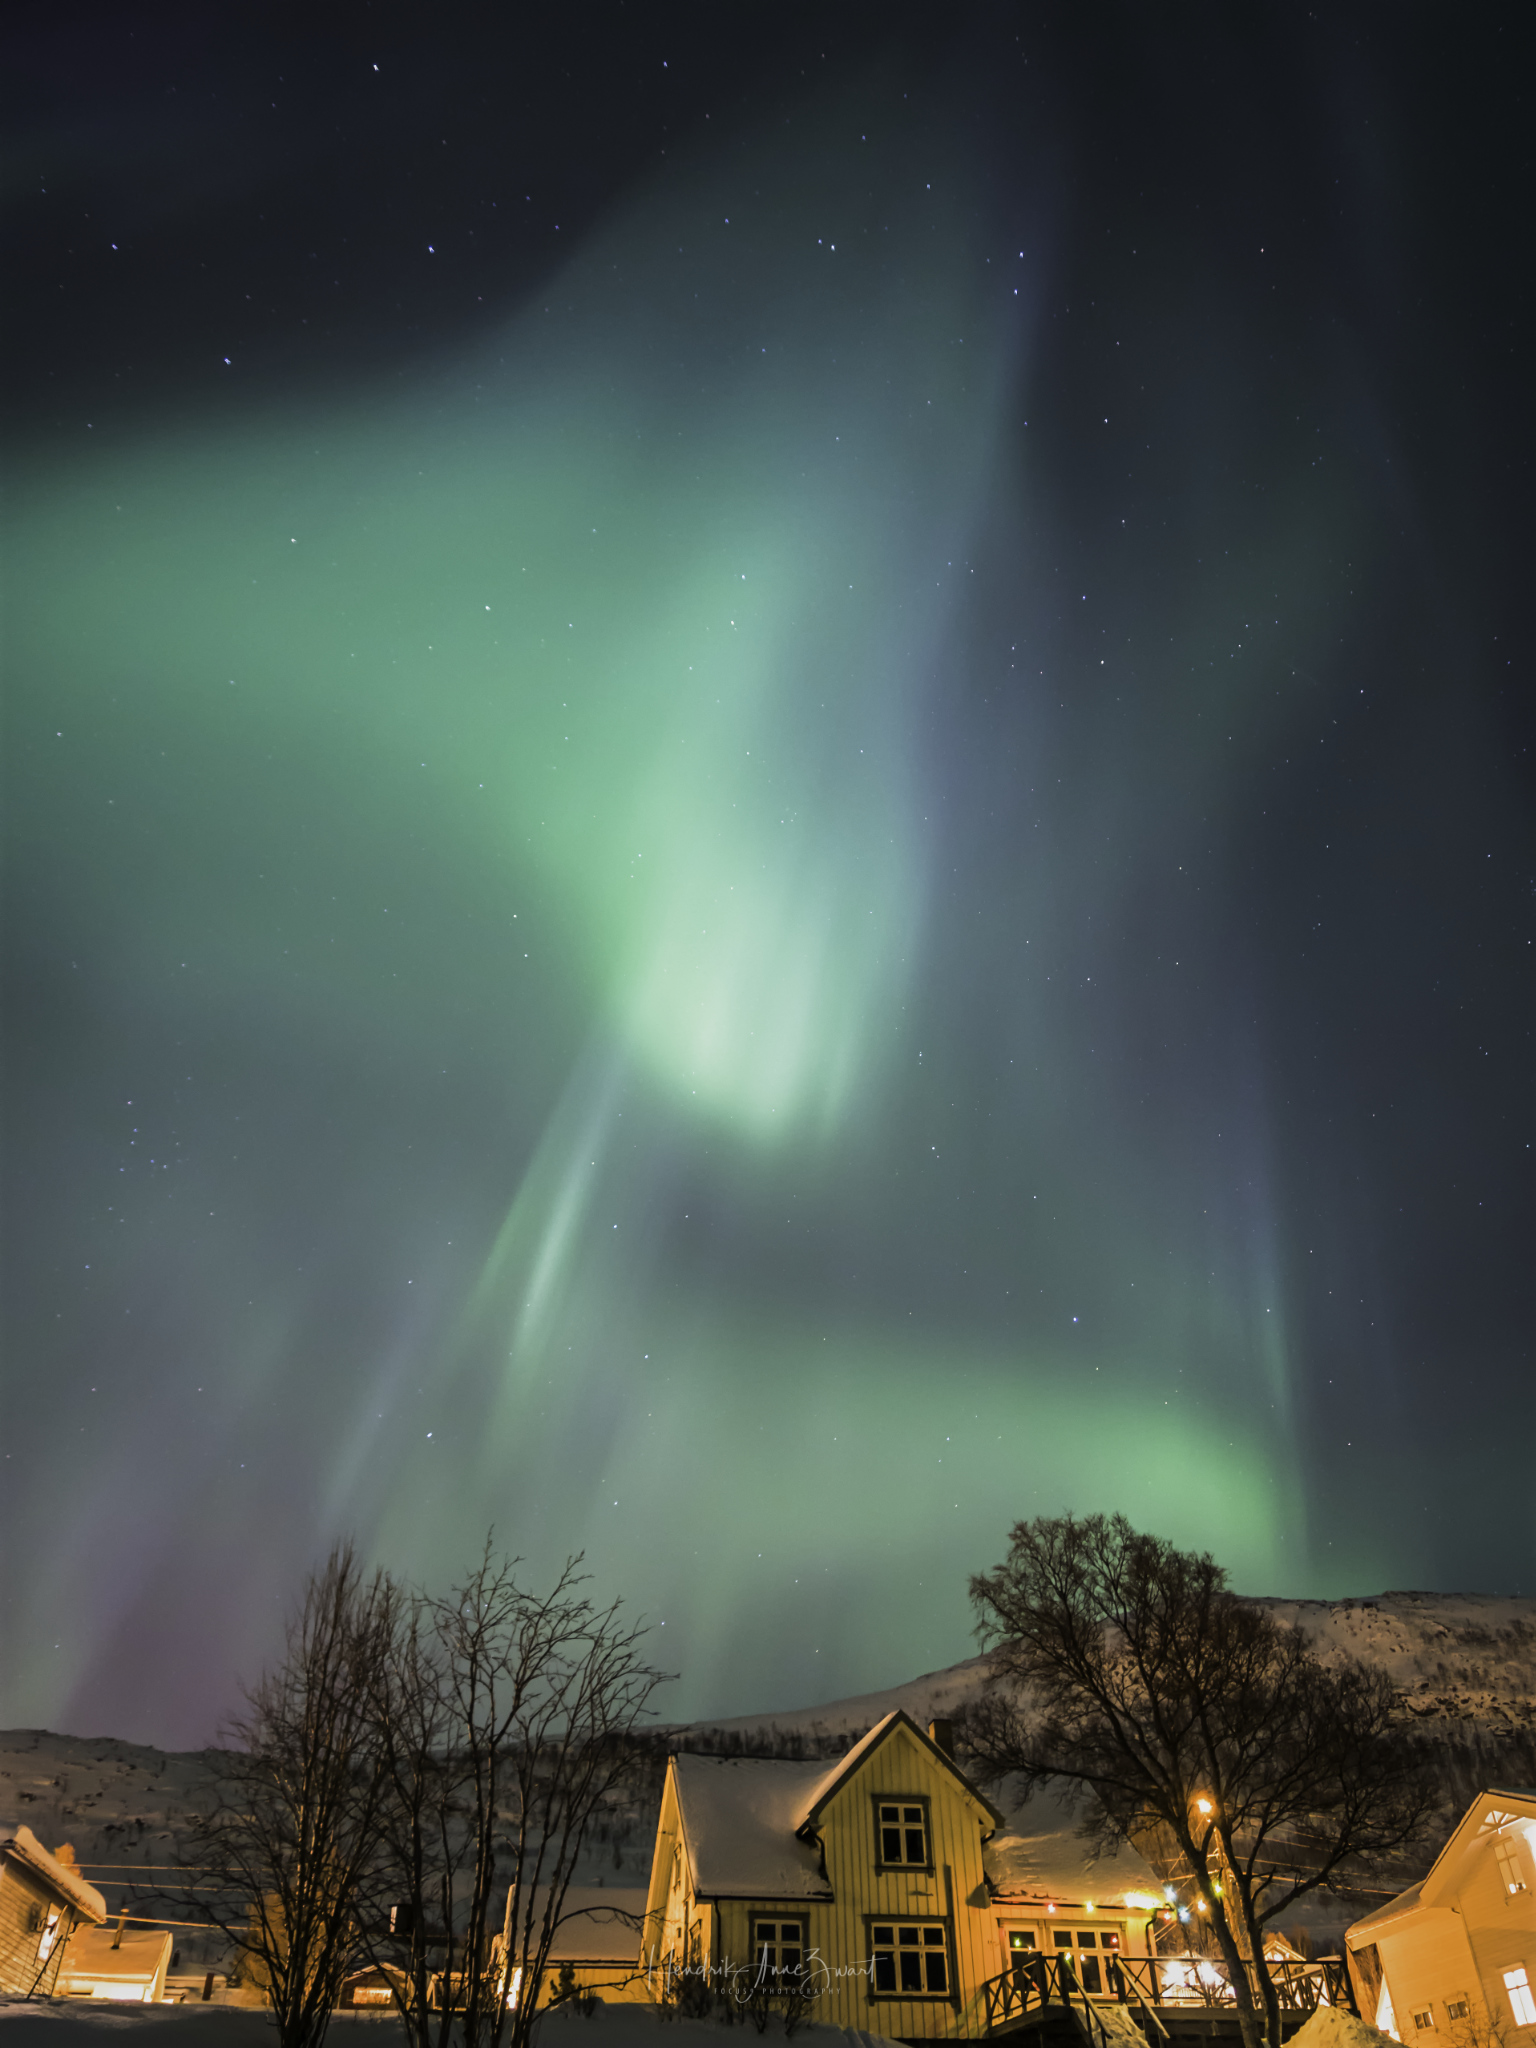 Nordic_Light_Notthern_Lights_Norway_Ersfjordbotn_3.jpg